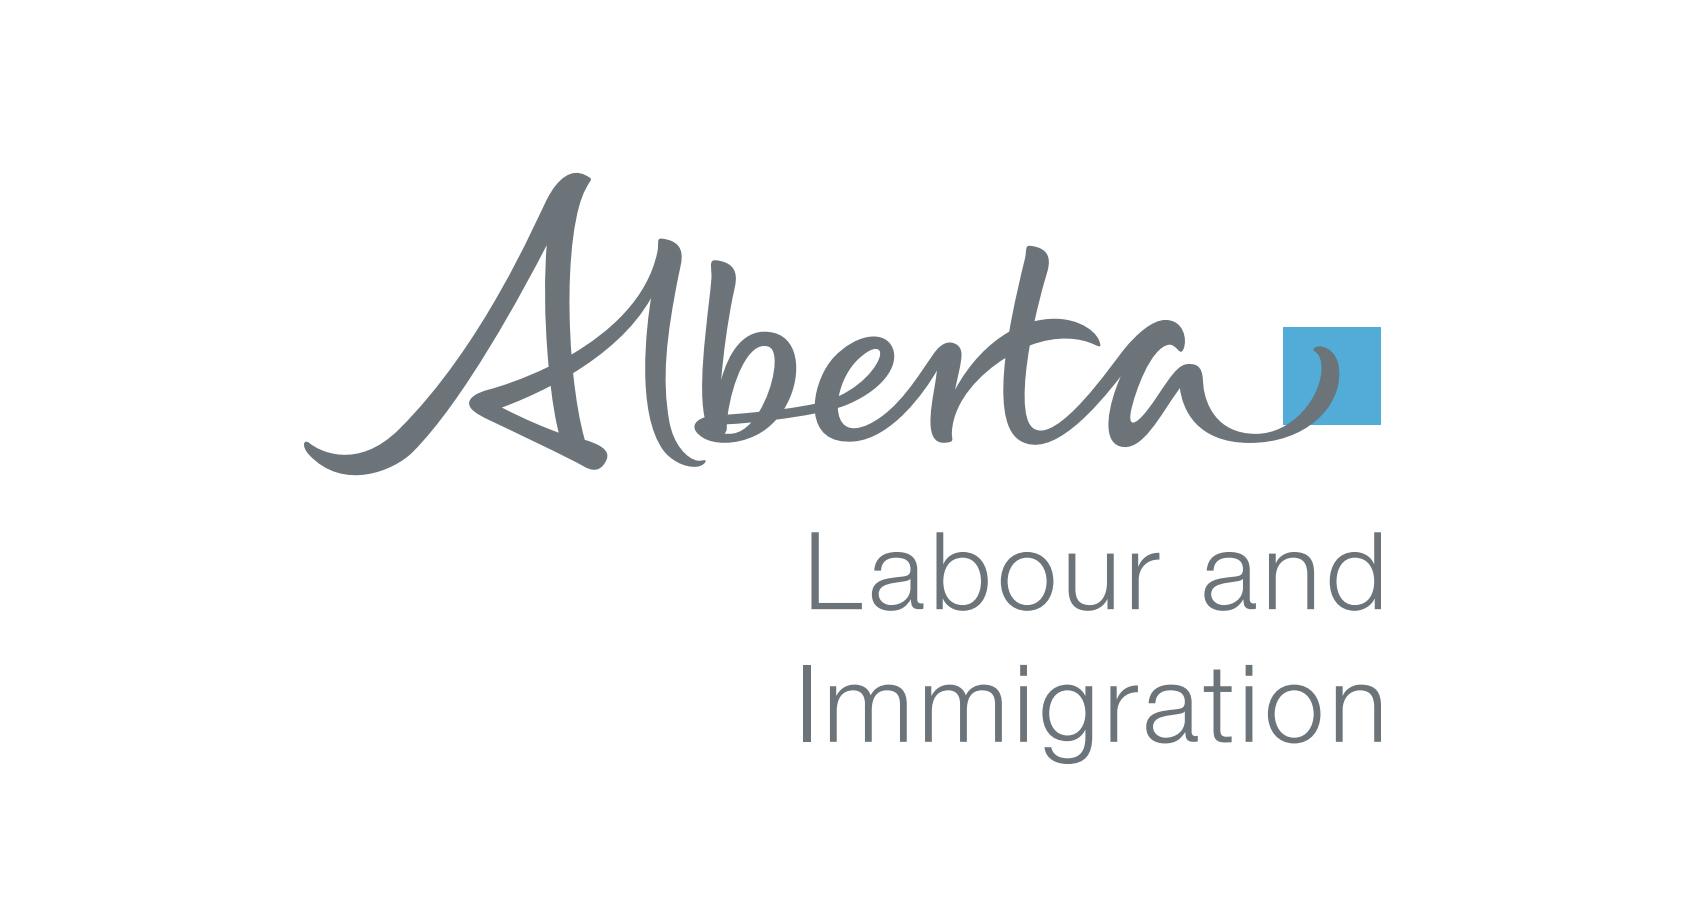 Employment Standards Policy & Legislation